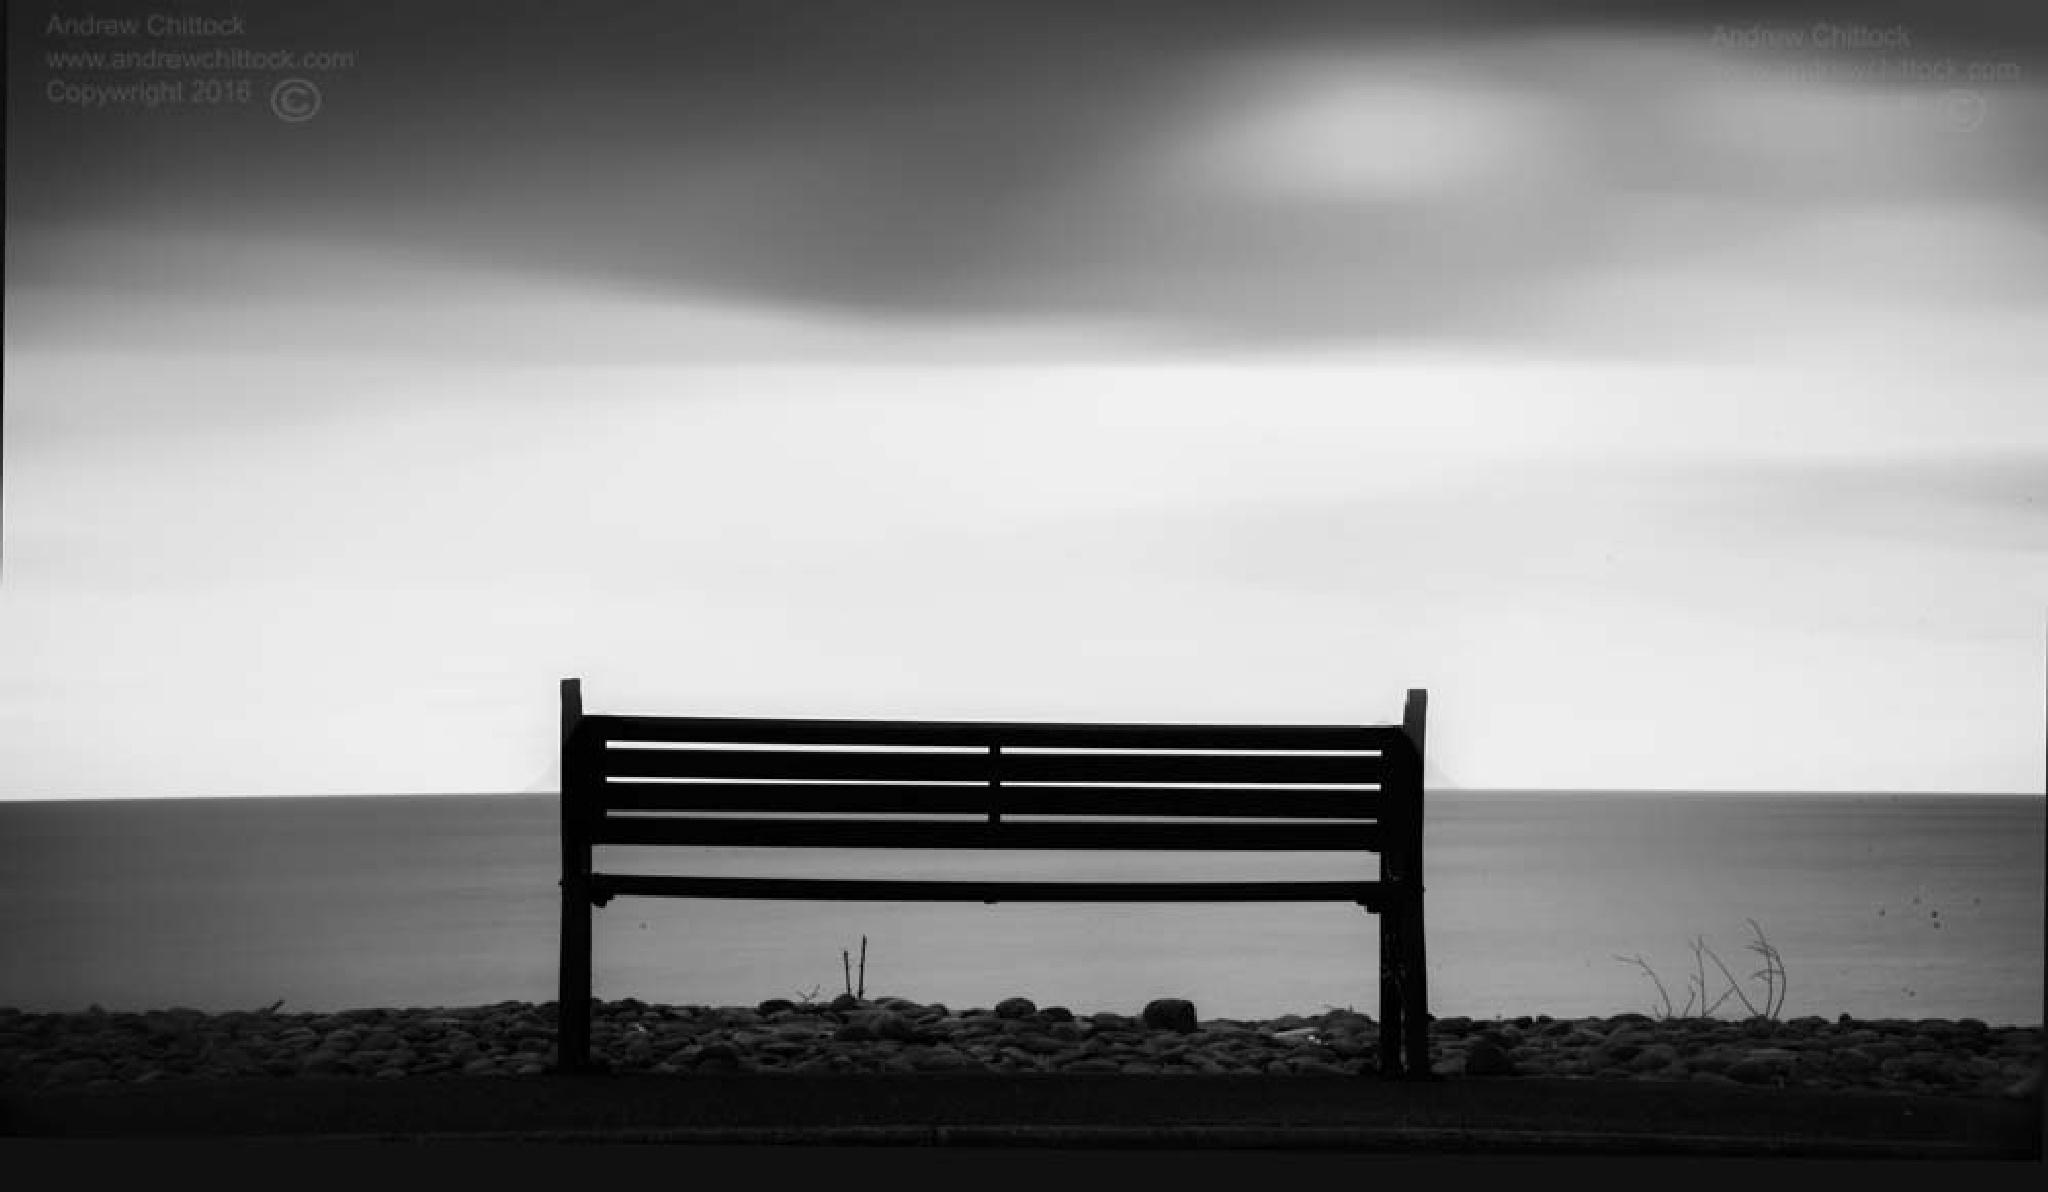 Bench by andychittockphotohrapher